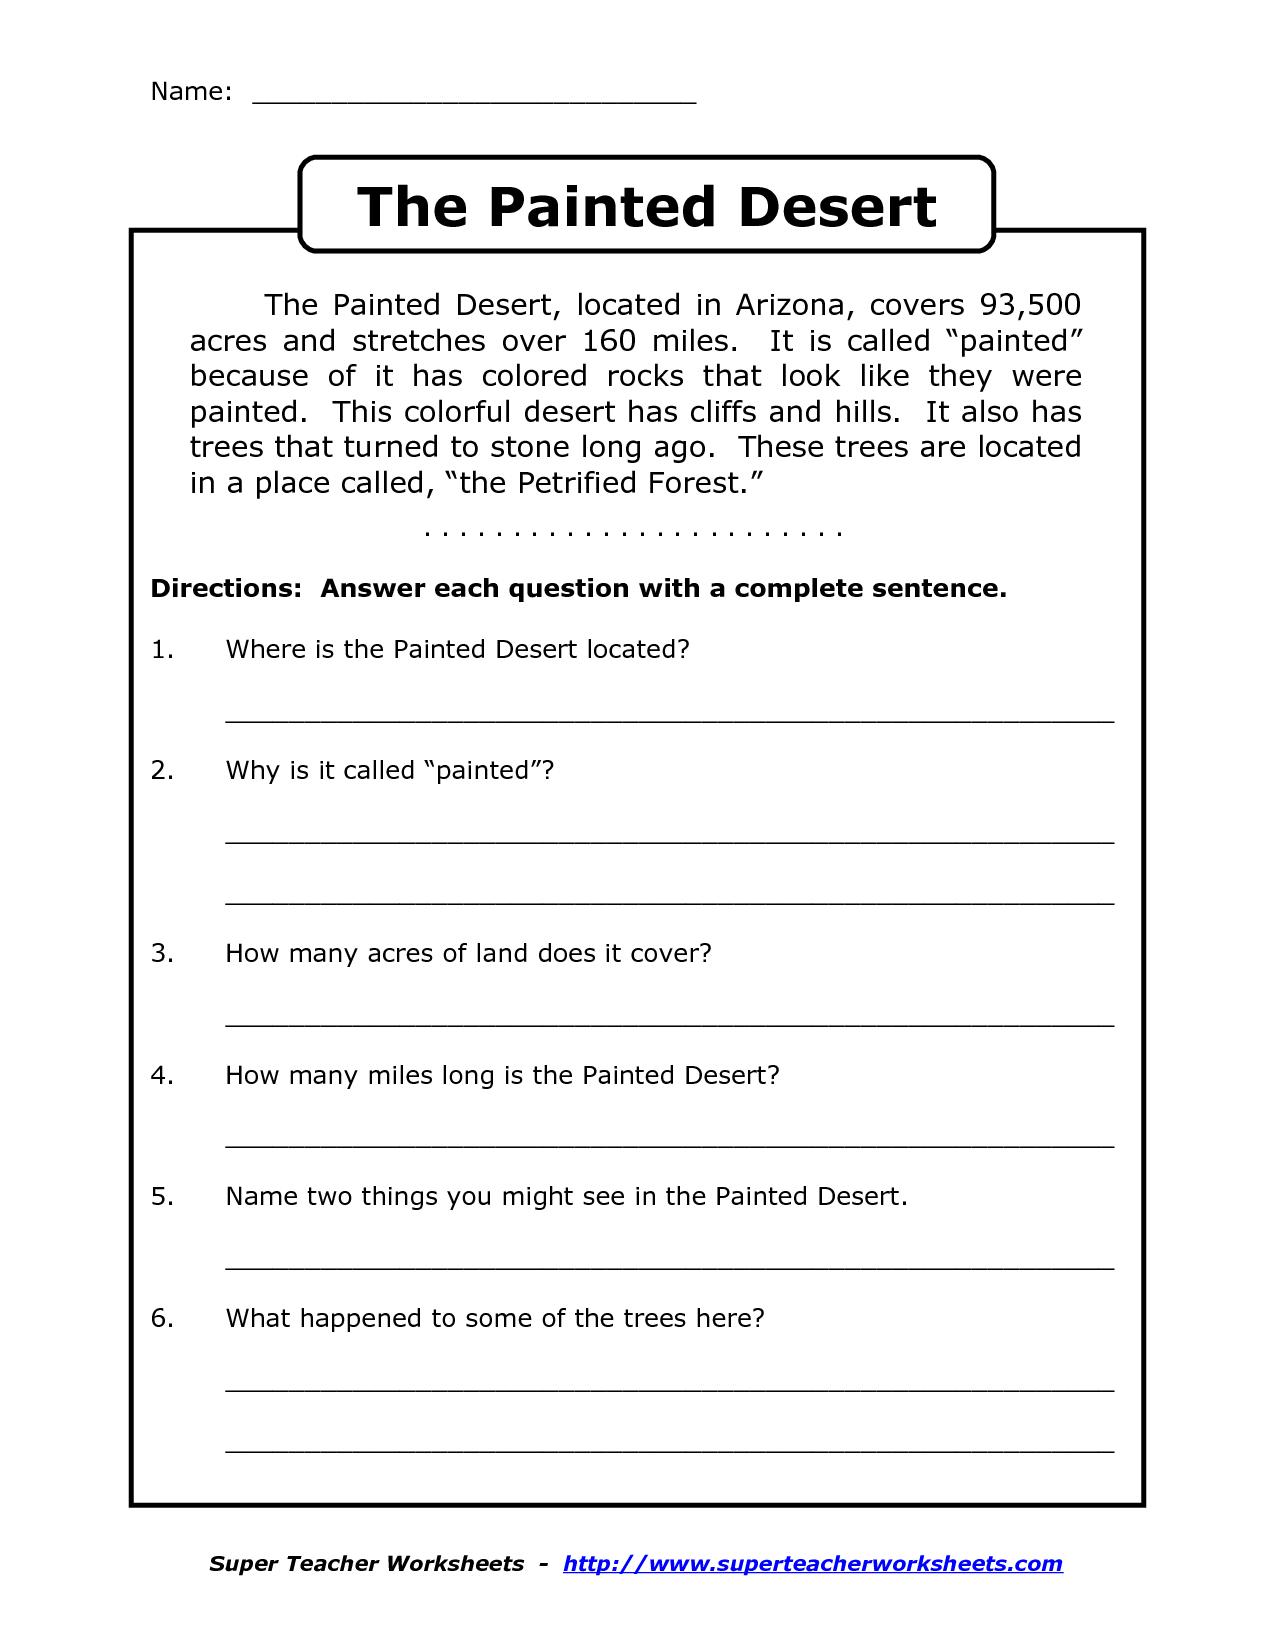 Reading Worksheets For 4Th Grade   Reading Comprehension Worksheets - Free Printable 4Th Grade Reading Worksheets